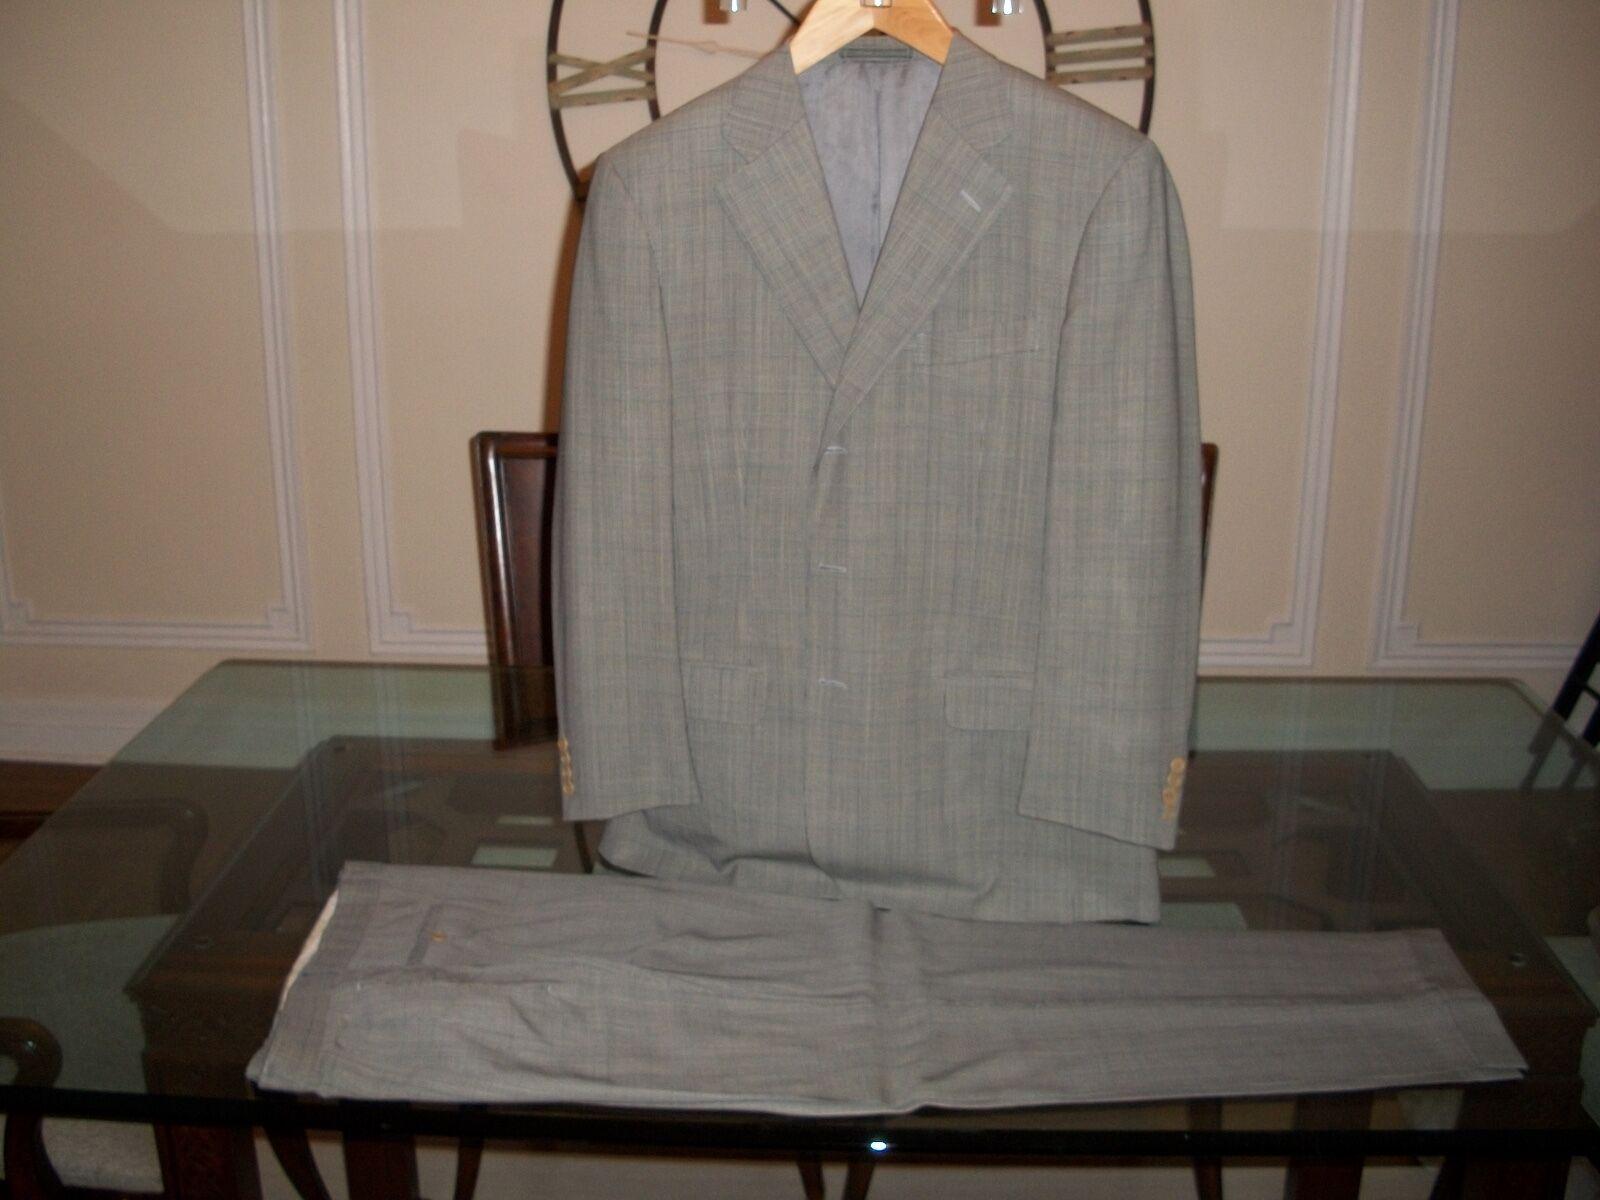 Used ERMENEGILDO ZEGNA Grau glenplaid suit EU 52R US 42R 34 x 30  2195